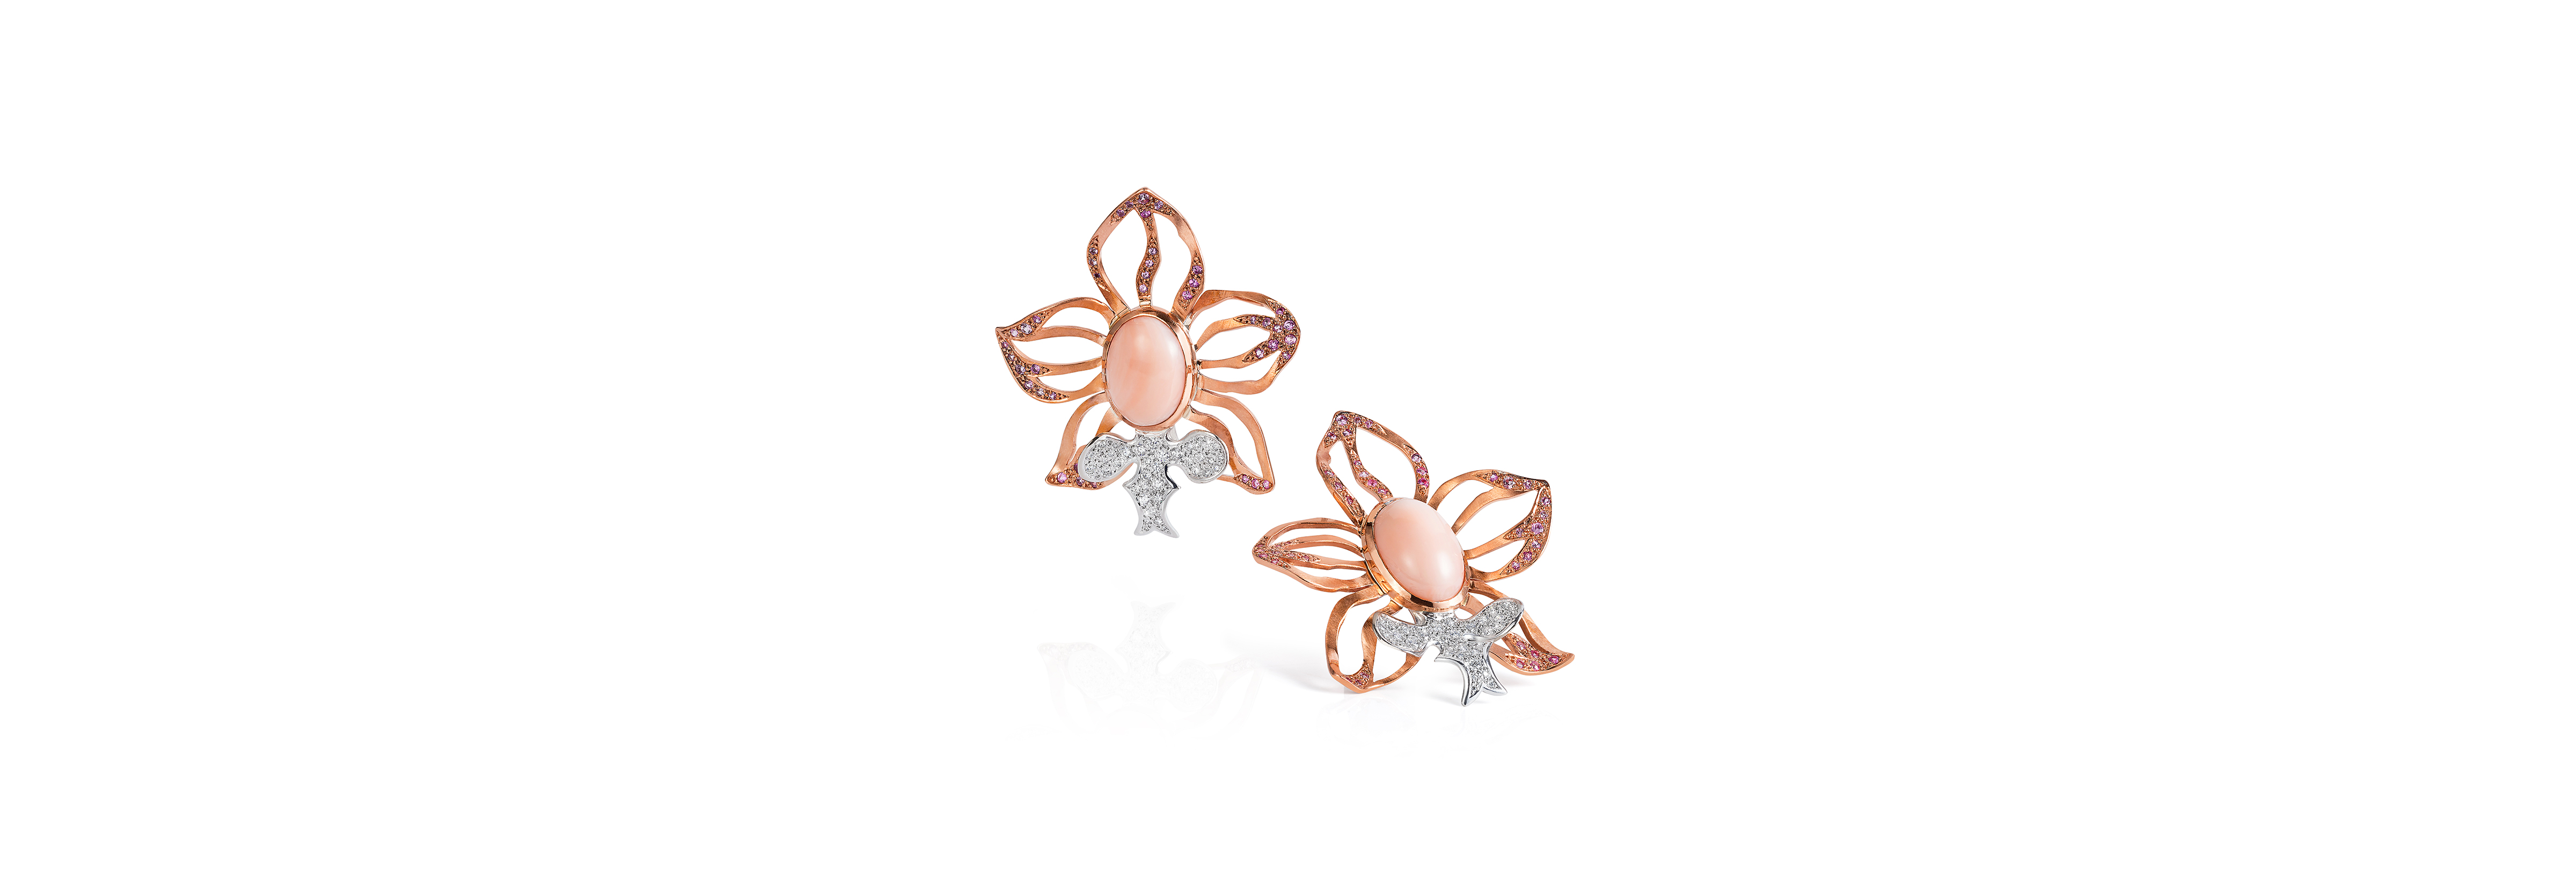 Queen Orchid Earrings